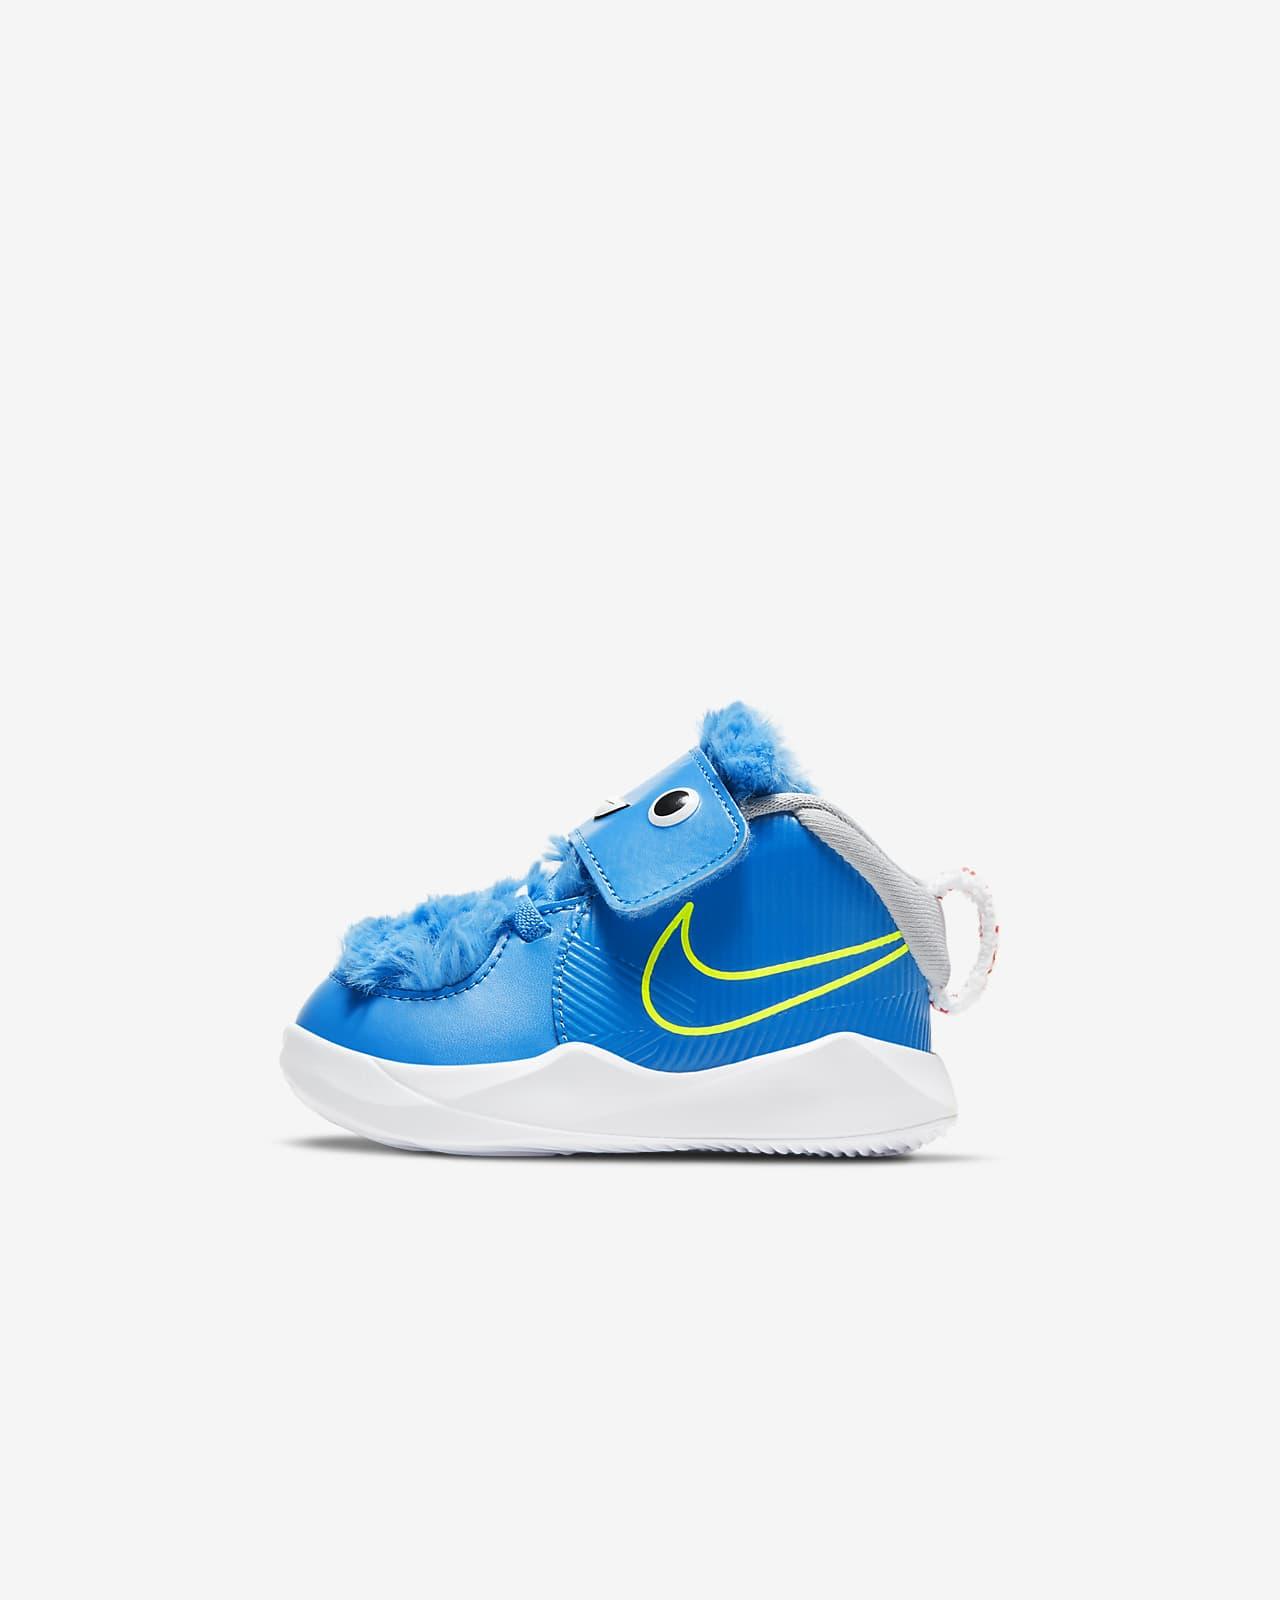 Nike Team Hustle D 9 Fast n Furry Baby & Toddler Shoe